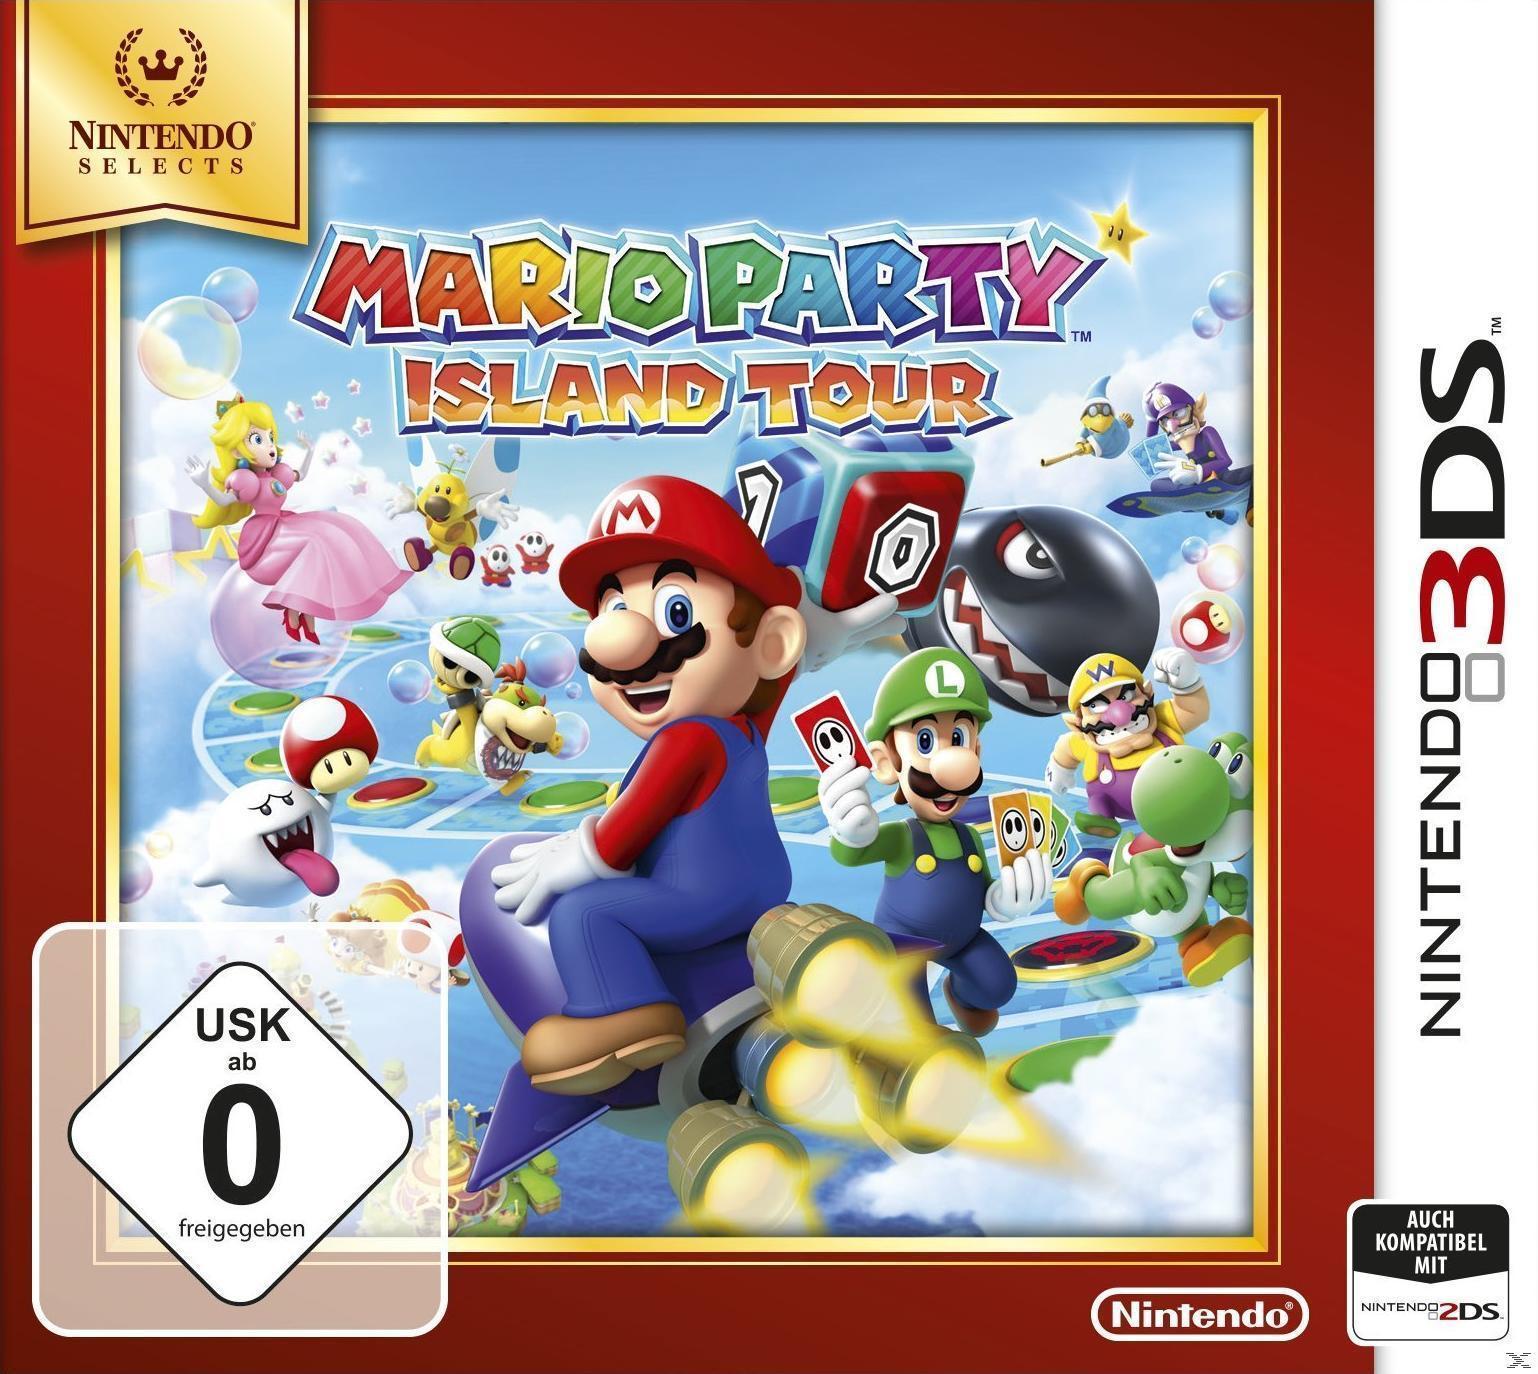 Mario Party: Island Tour (Nintendo Selects) (Nintendo 3DS) für 17,00 Euro